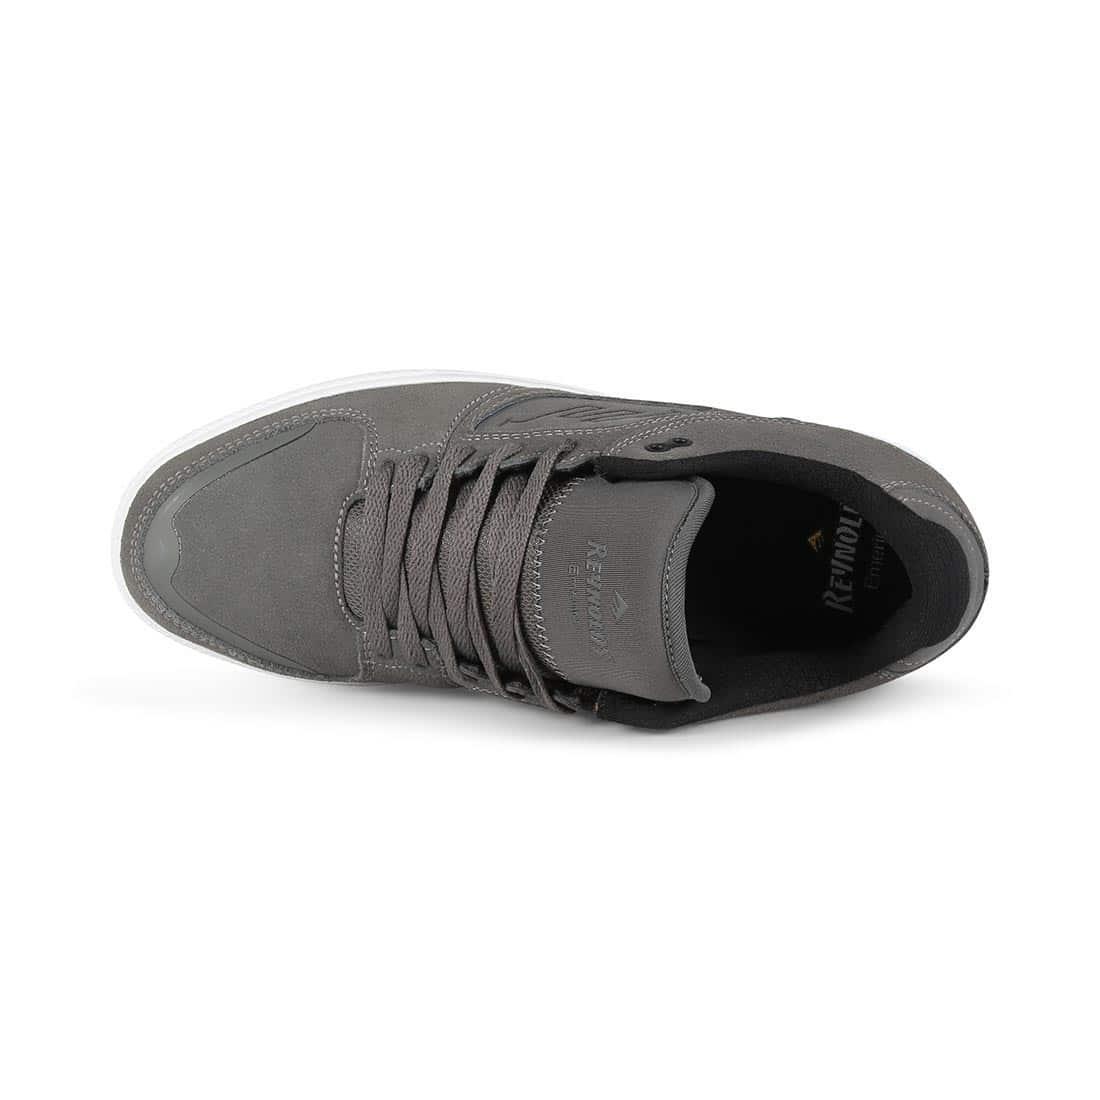 Emerica Reynolds G6 Shoes Grey